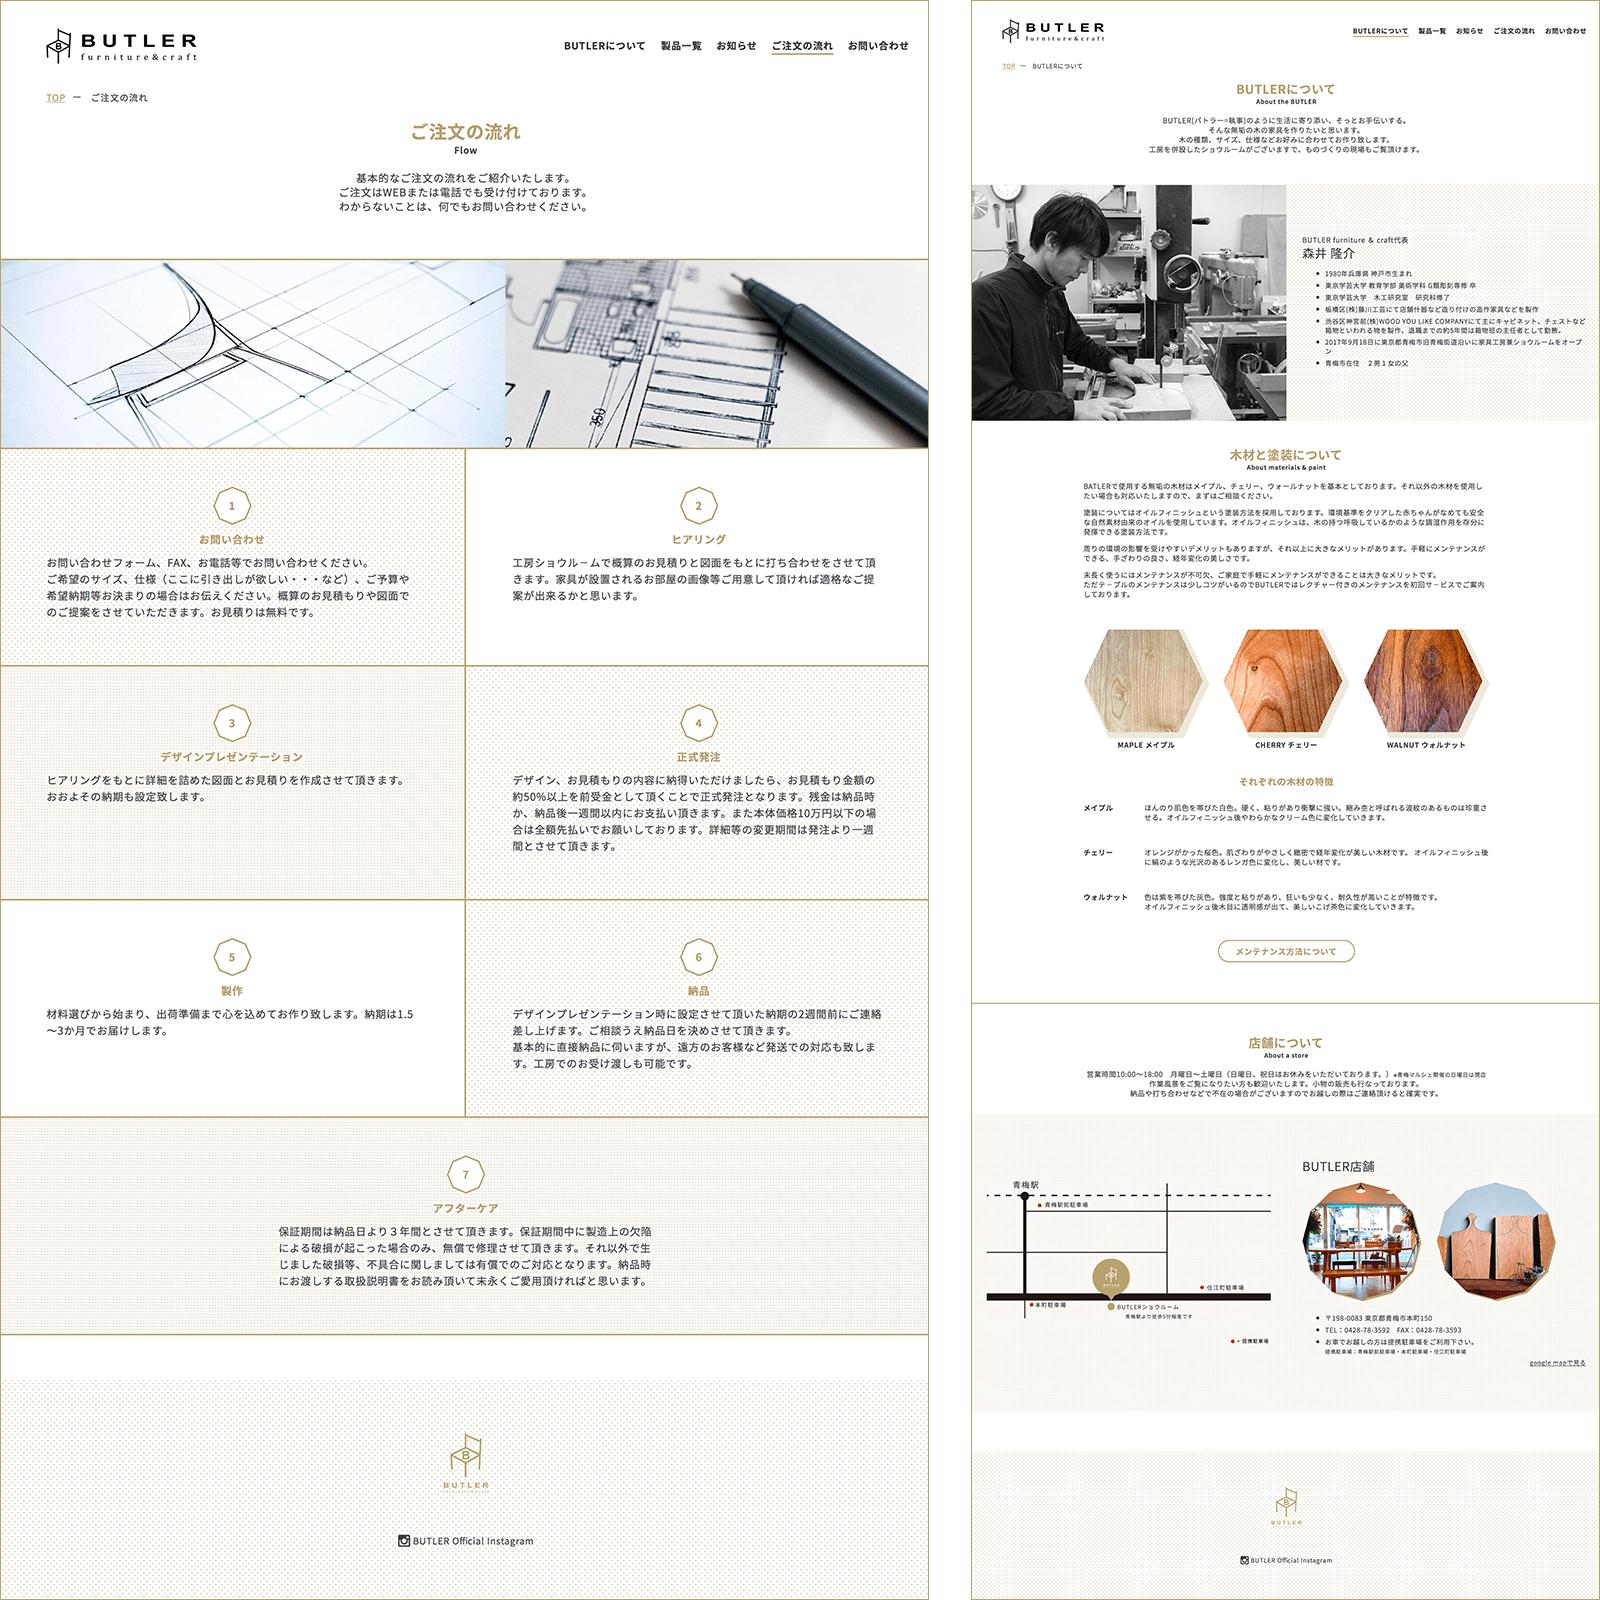 BUTLERウェブサイト制作 下層ページ